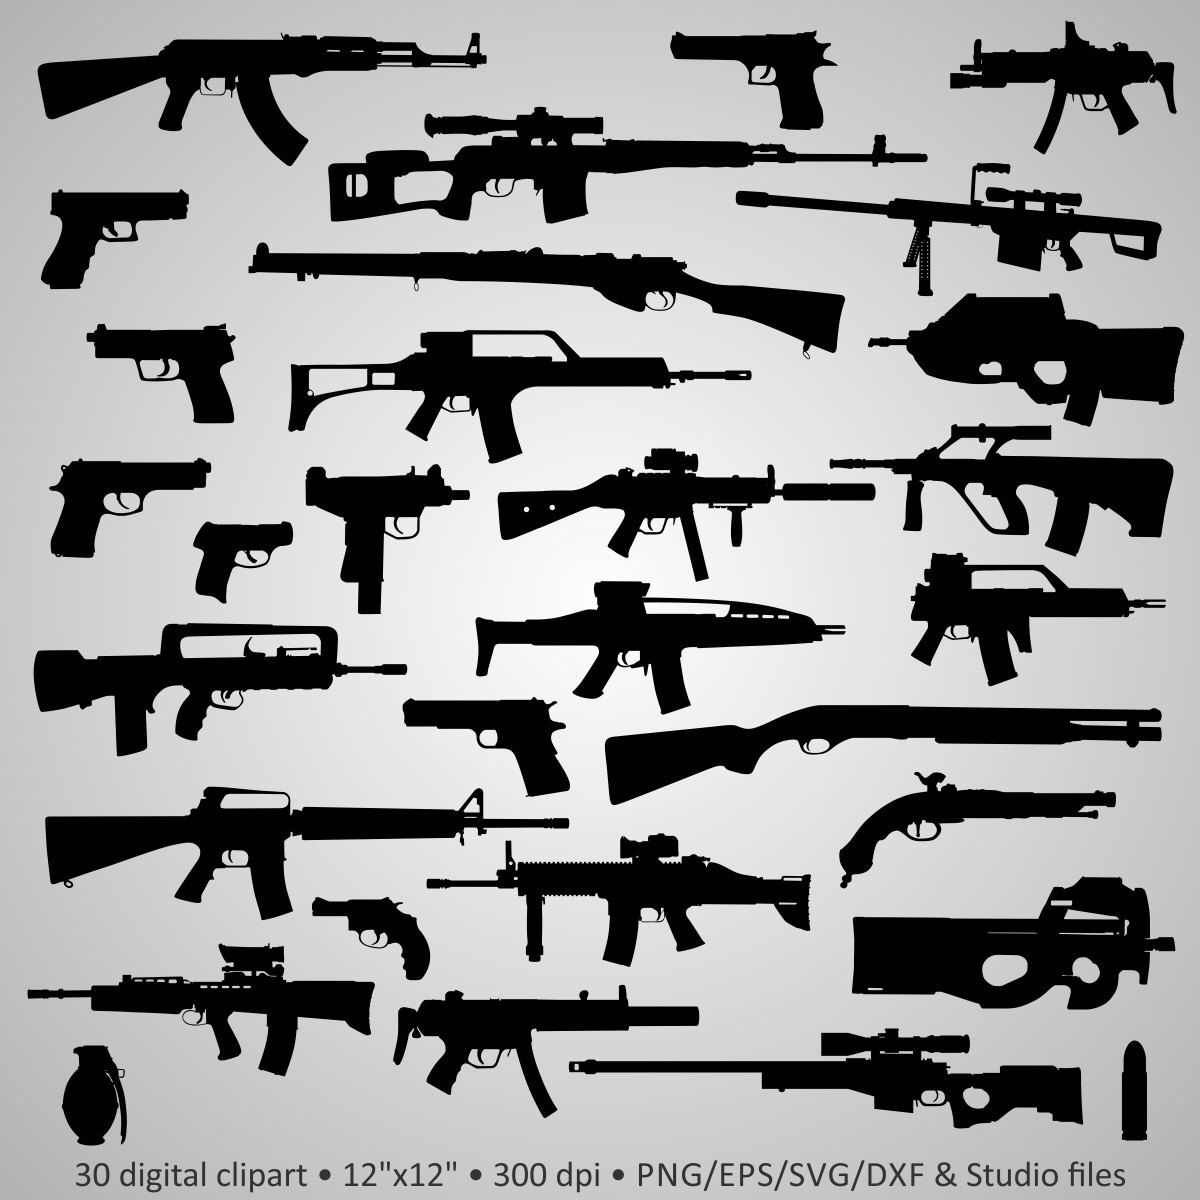 Buy 2 Get 1 Free! Digital Clipart Silhouettes Guns, Weapon AK-47 SVD ...